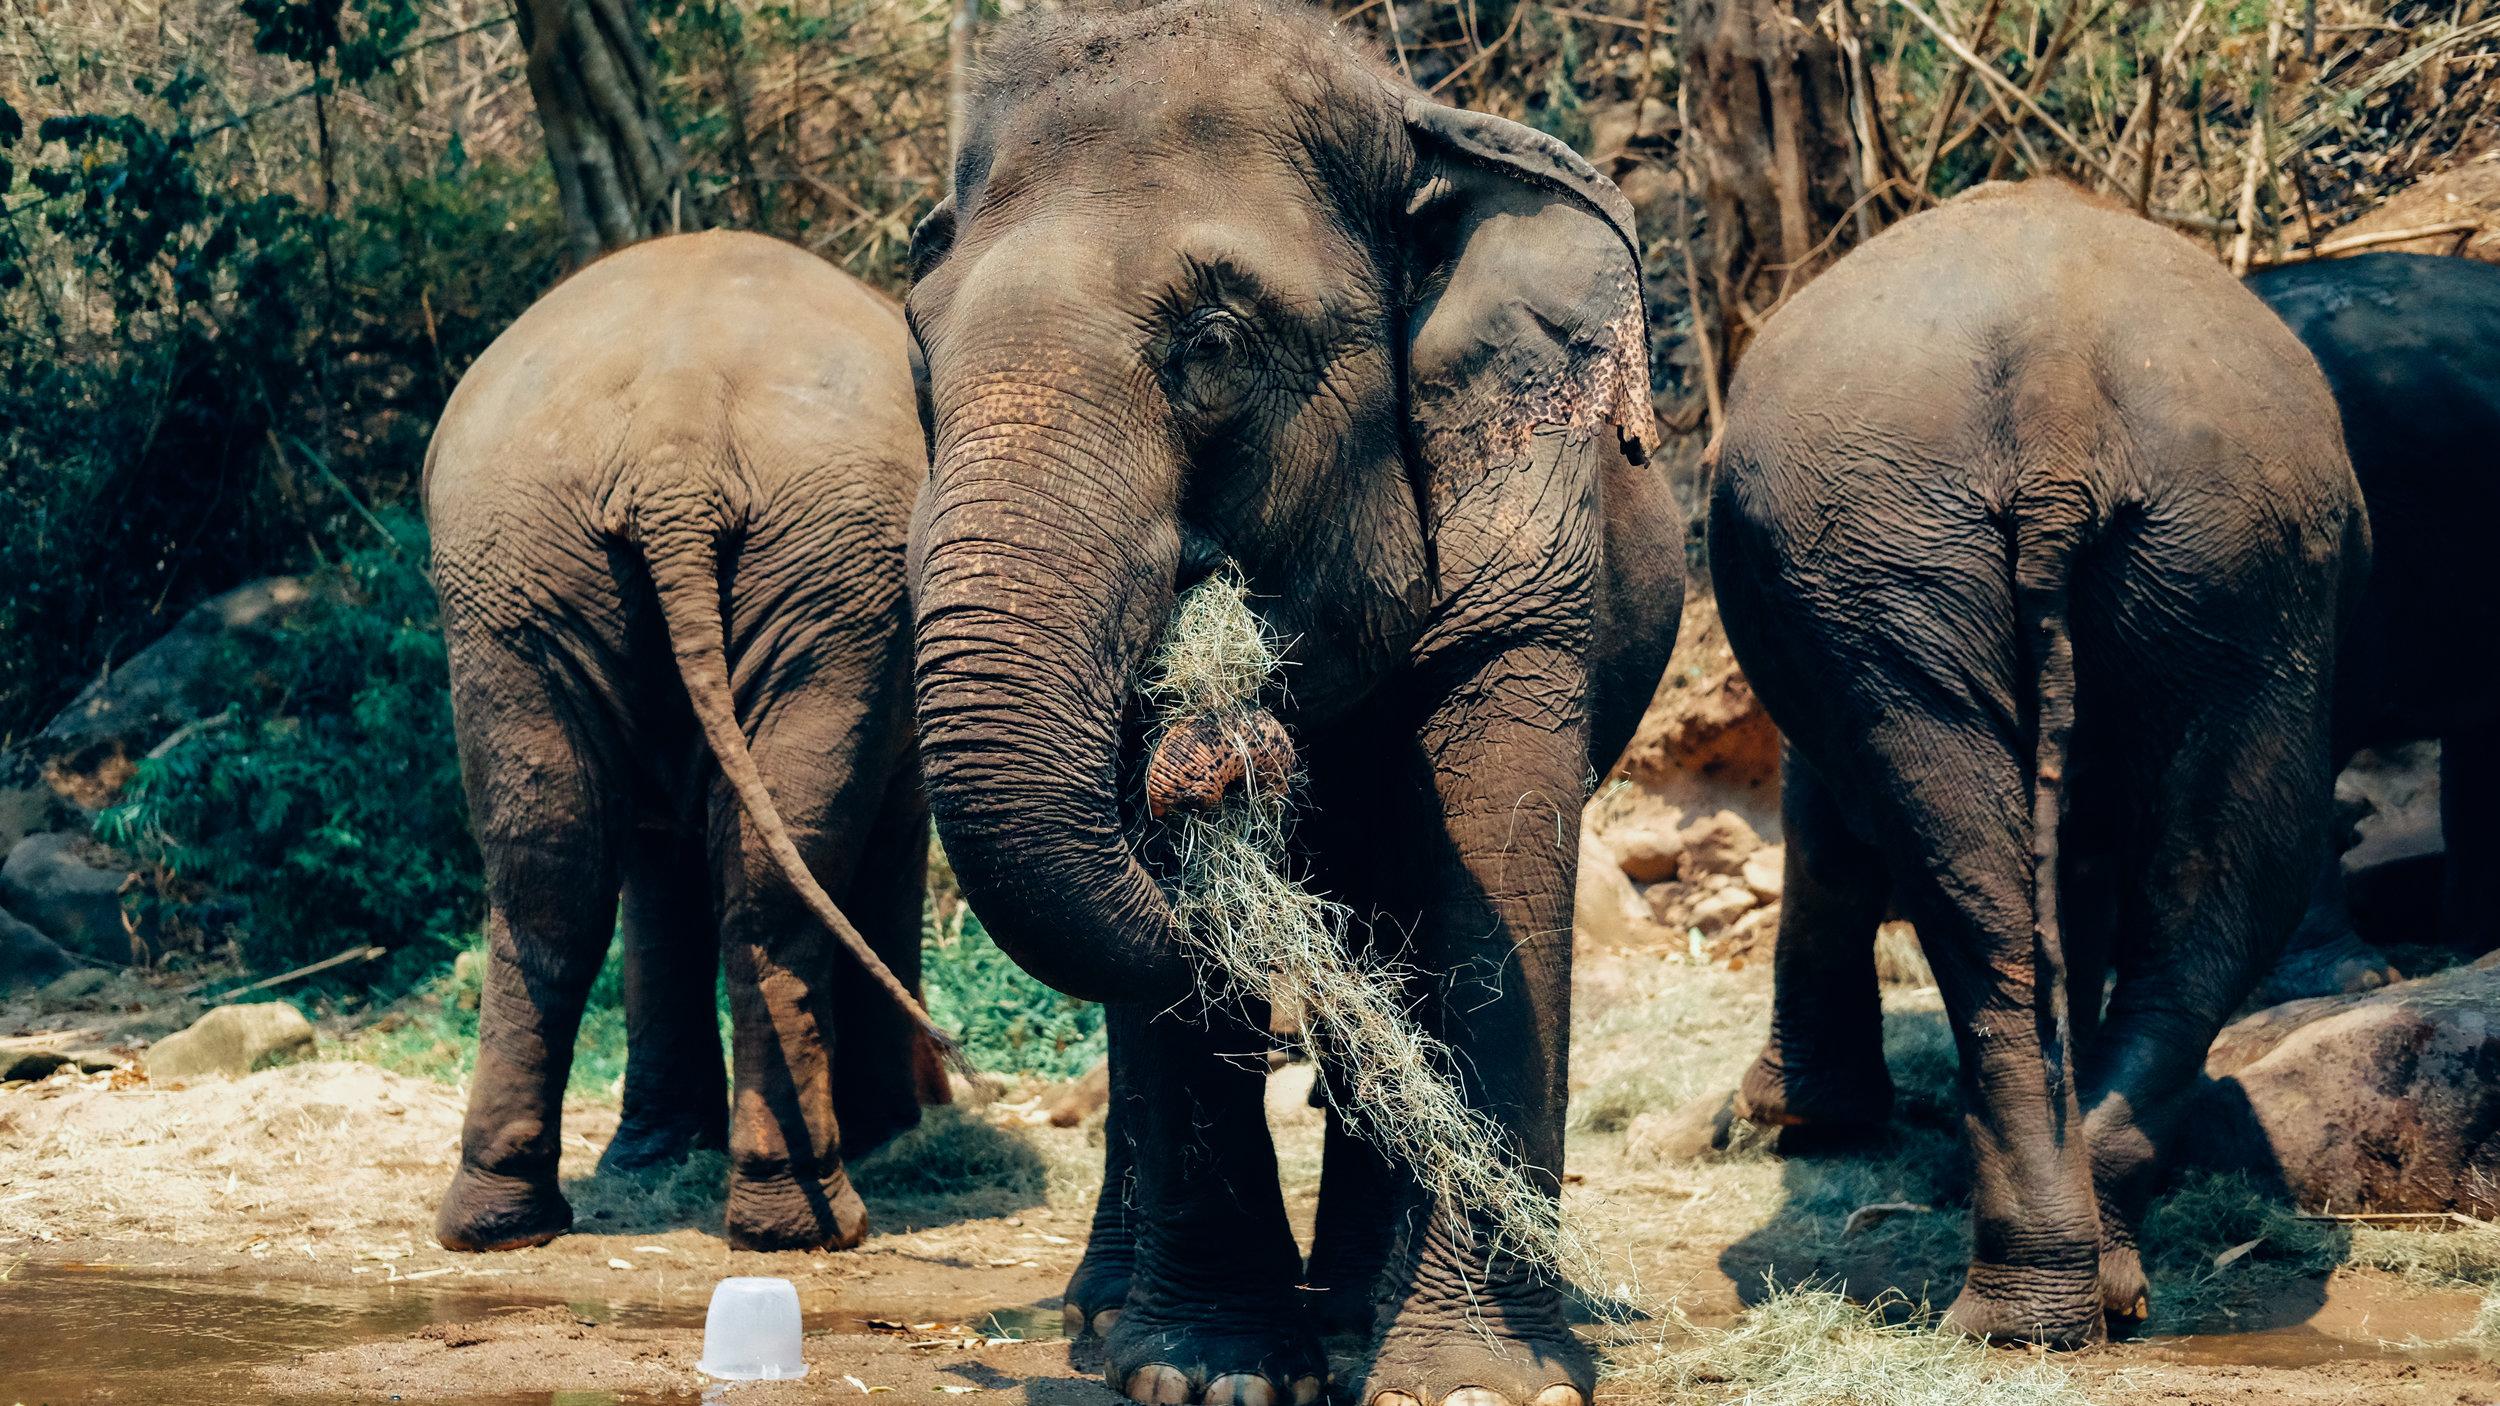 "The elephant group that we walked with at the  Elephant Nature Park , Chiang Mai. Travel photography and guide by © Natasha Lequepeys for ""And Then I Met Yoko"". #thailand #seasia #travelguide #photoblog #travelblog #travelphotography #animalphotography #travelitinerary #fujifilm #krabi #bangkok #chiangmai #pattaya #elephantnaturepark #nature #elephants #animaltourism"